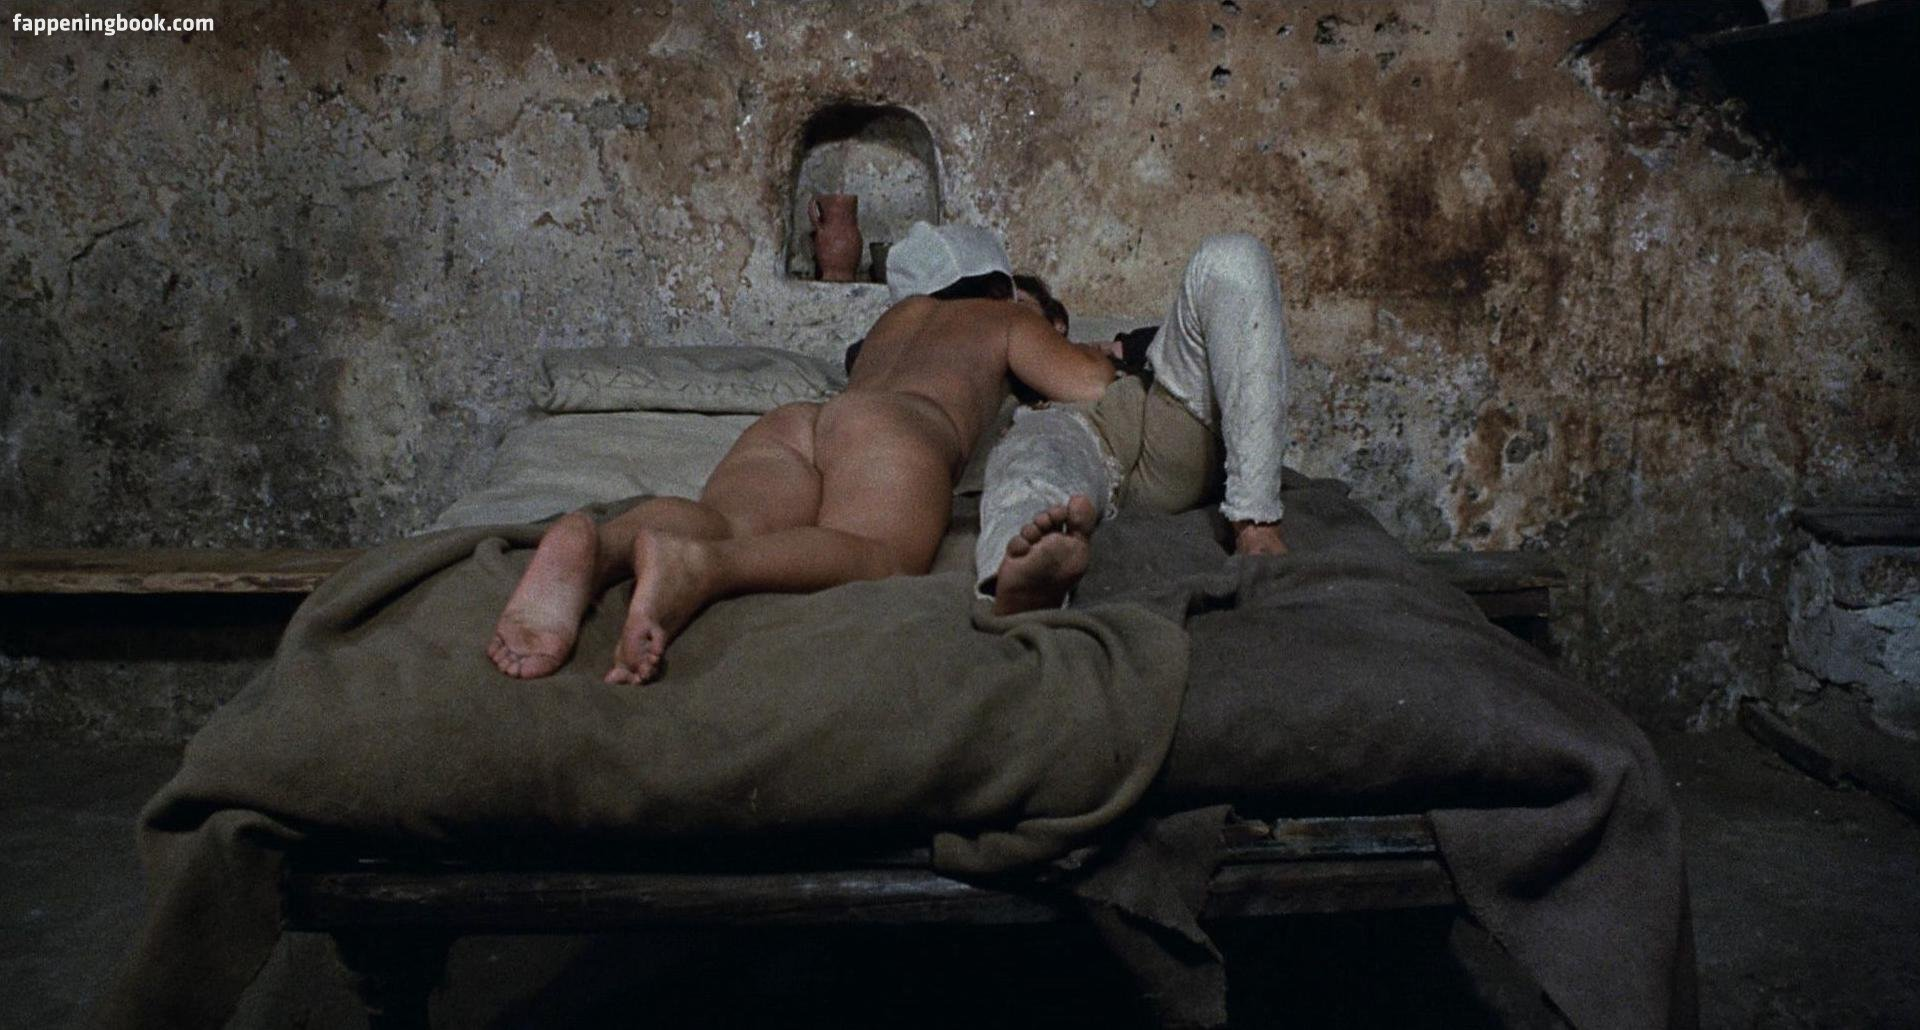 100 Images of Angela Luce Nuda